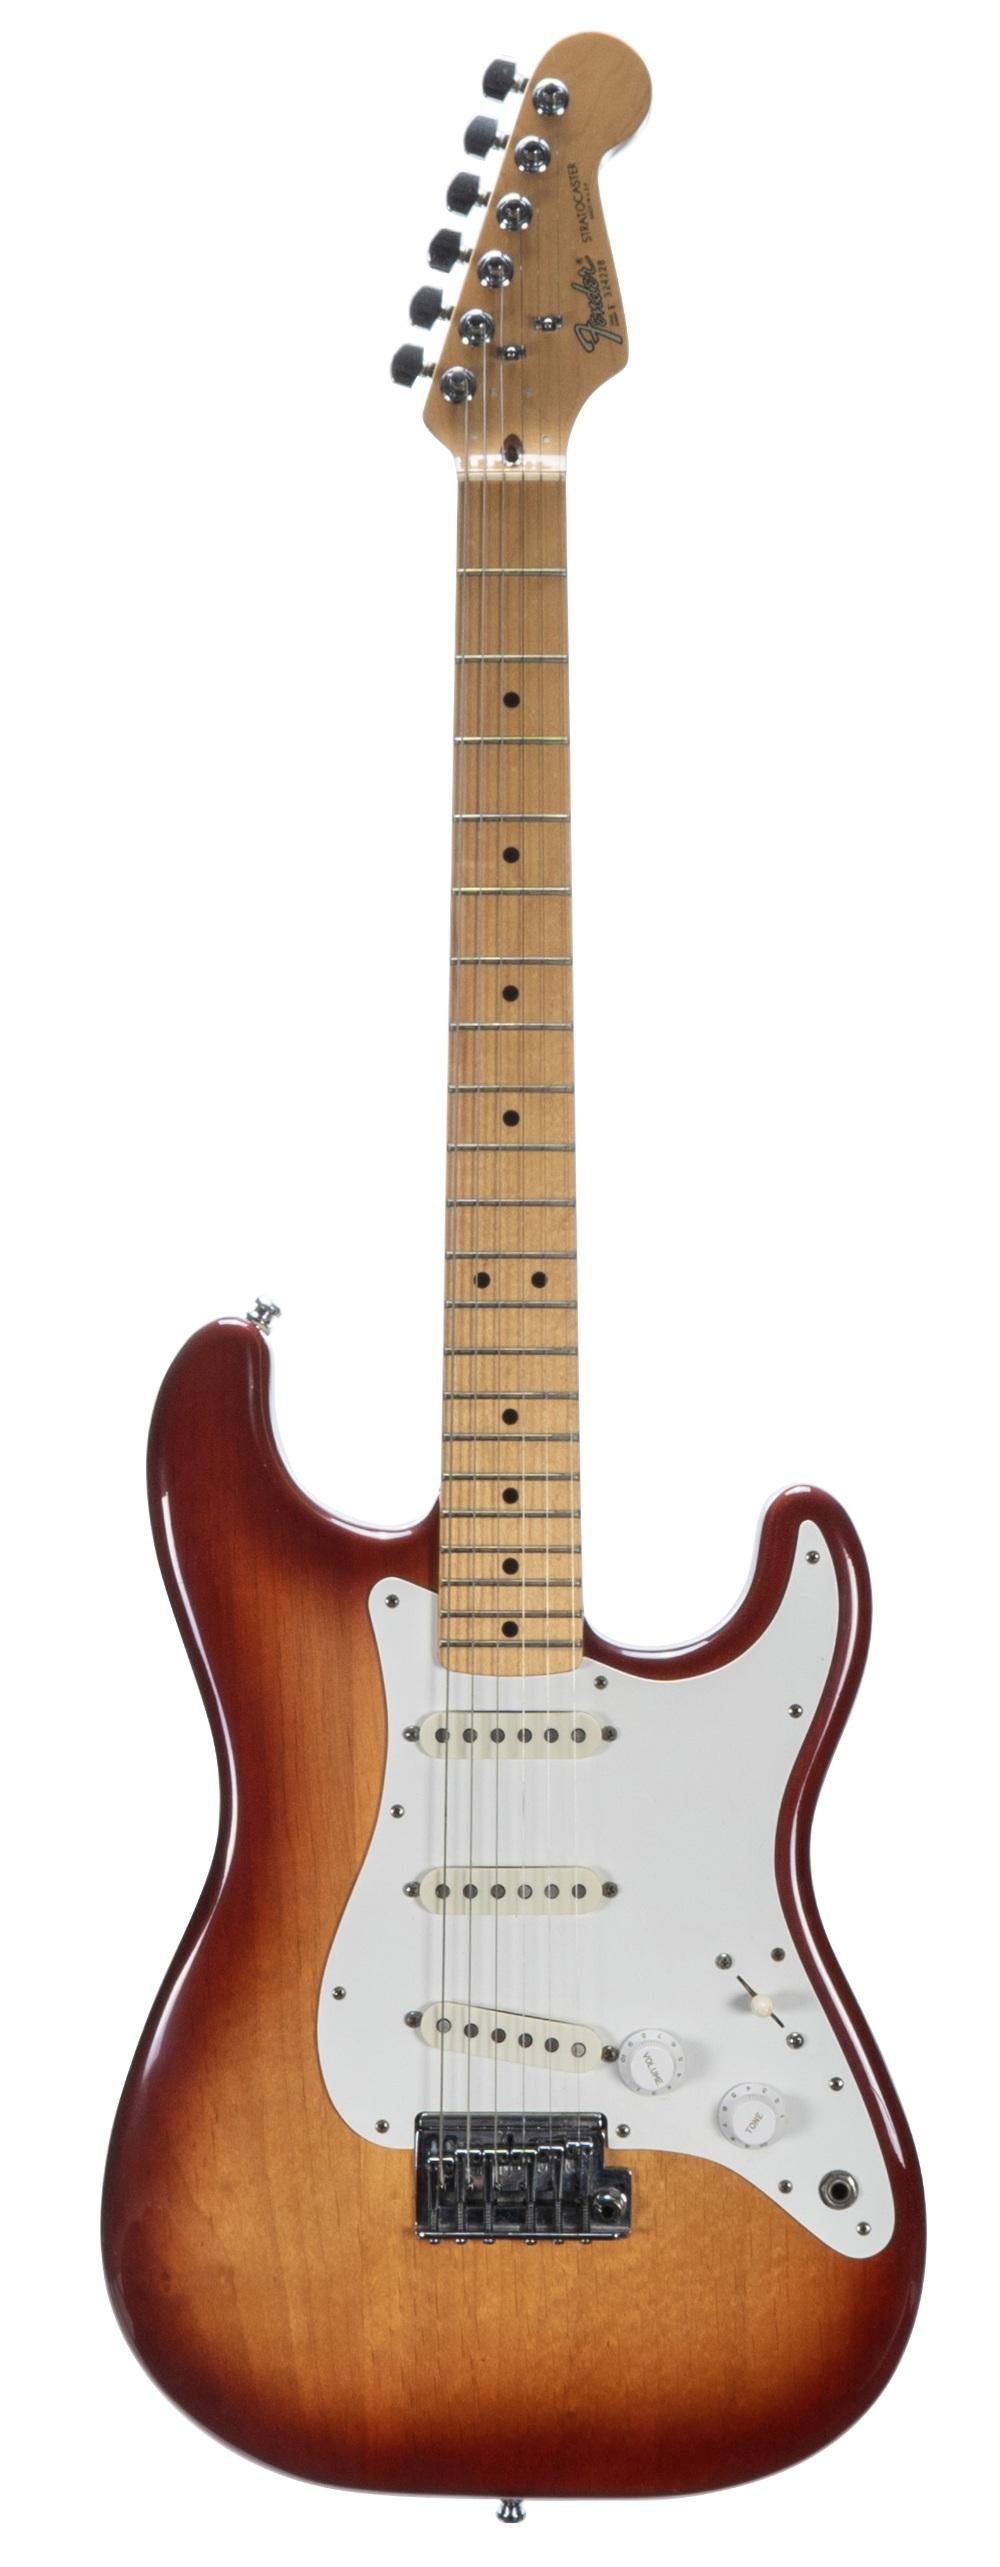 1983 Fender Dan Smith Era Stratocaster electric guitar, made in USA, ser. no. E3xxxx8; Finish: